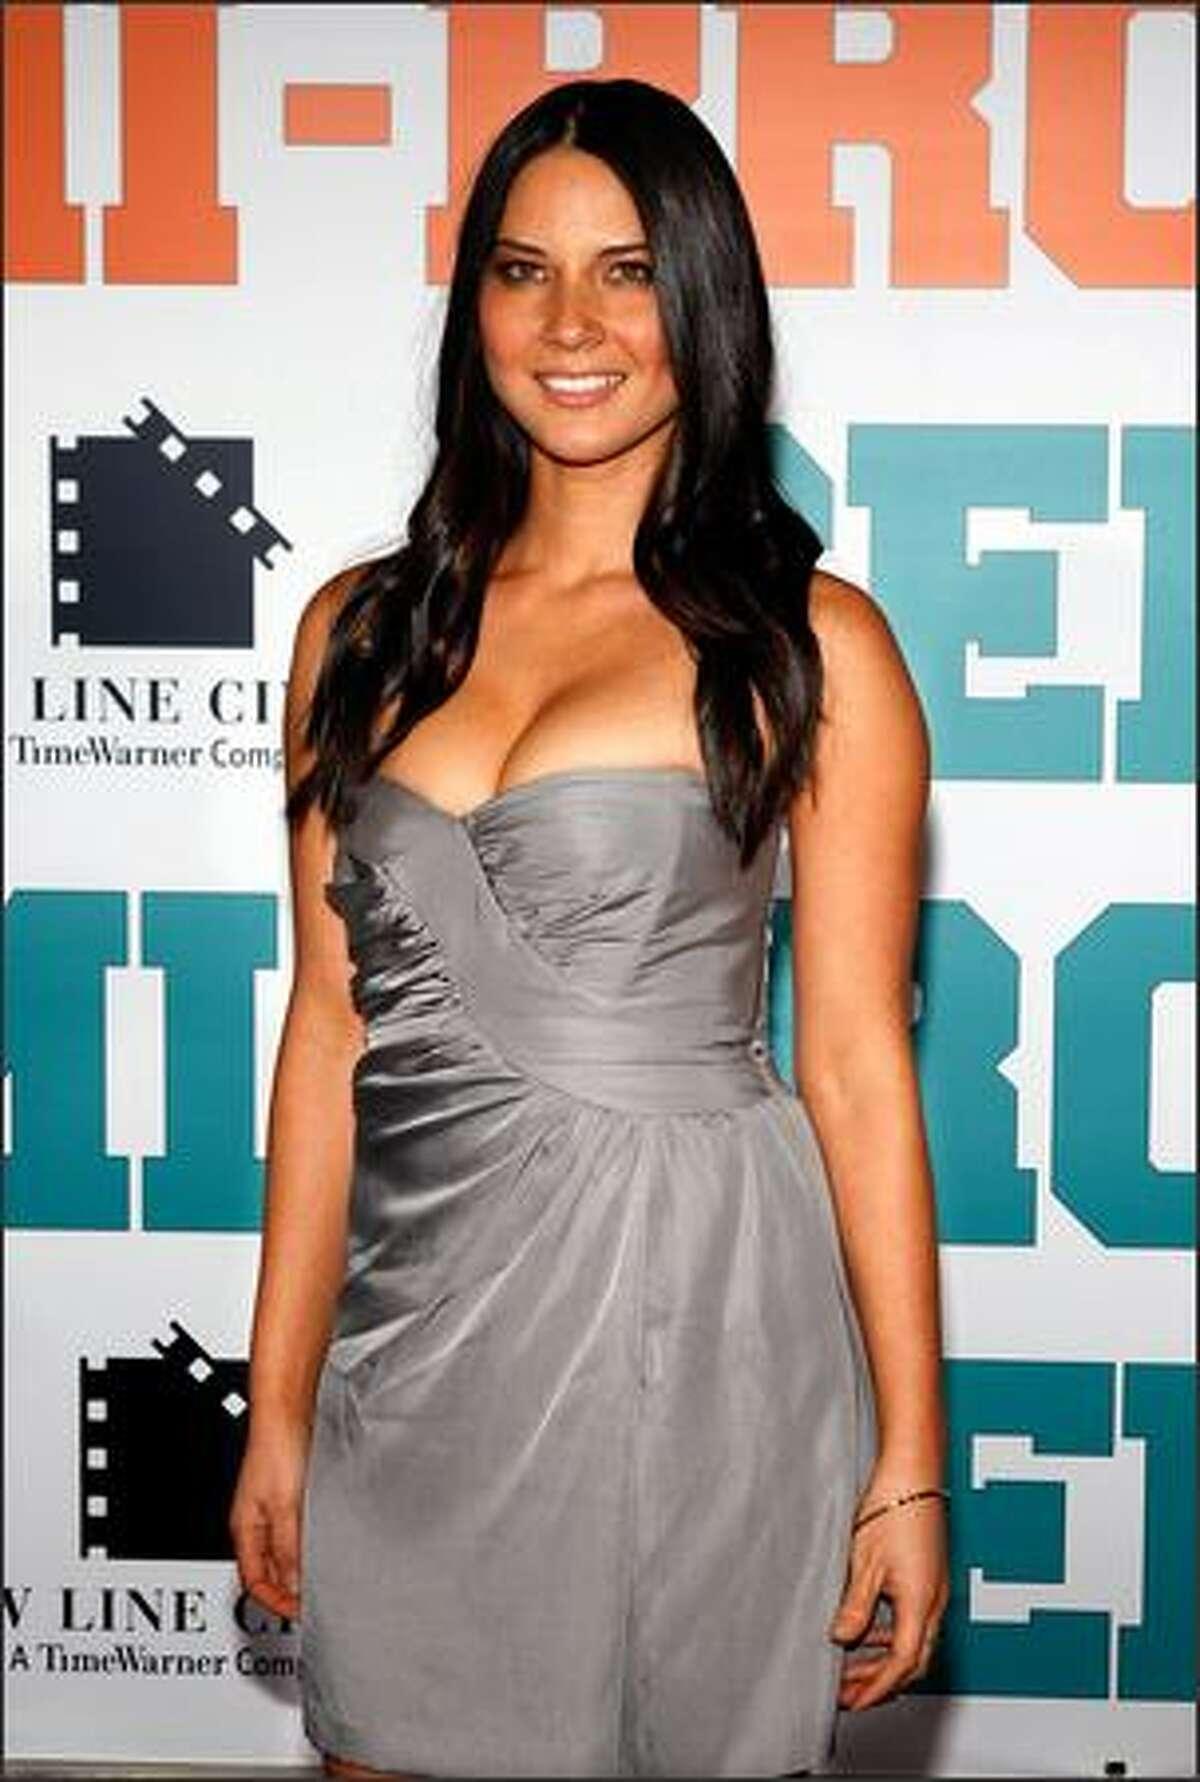 No. 96: TV personality Olivia Munn, 26 (